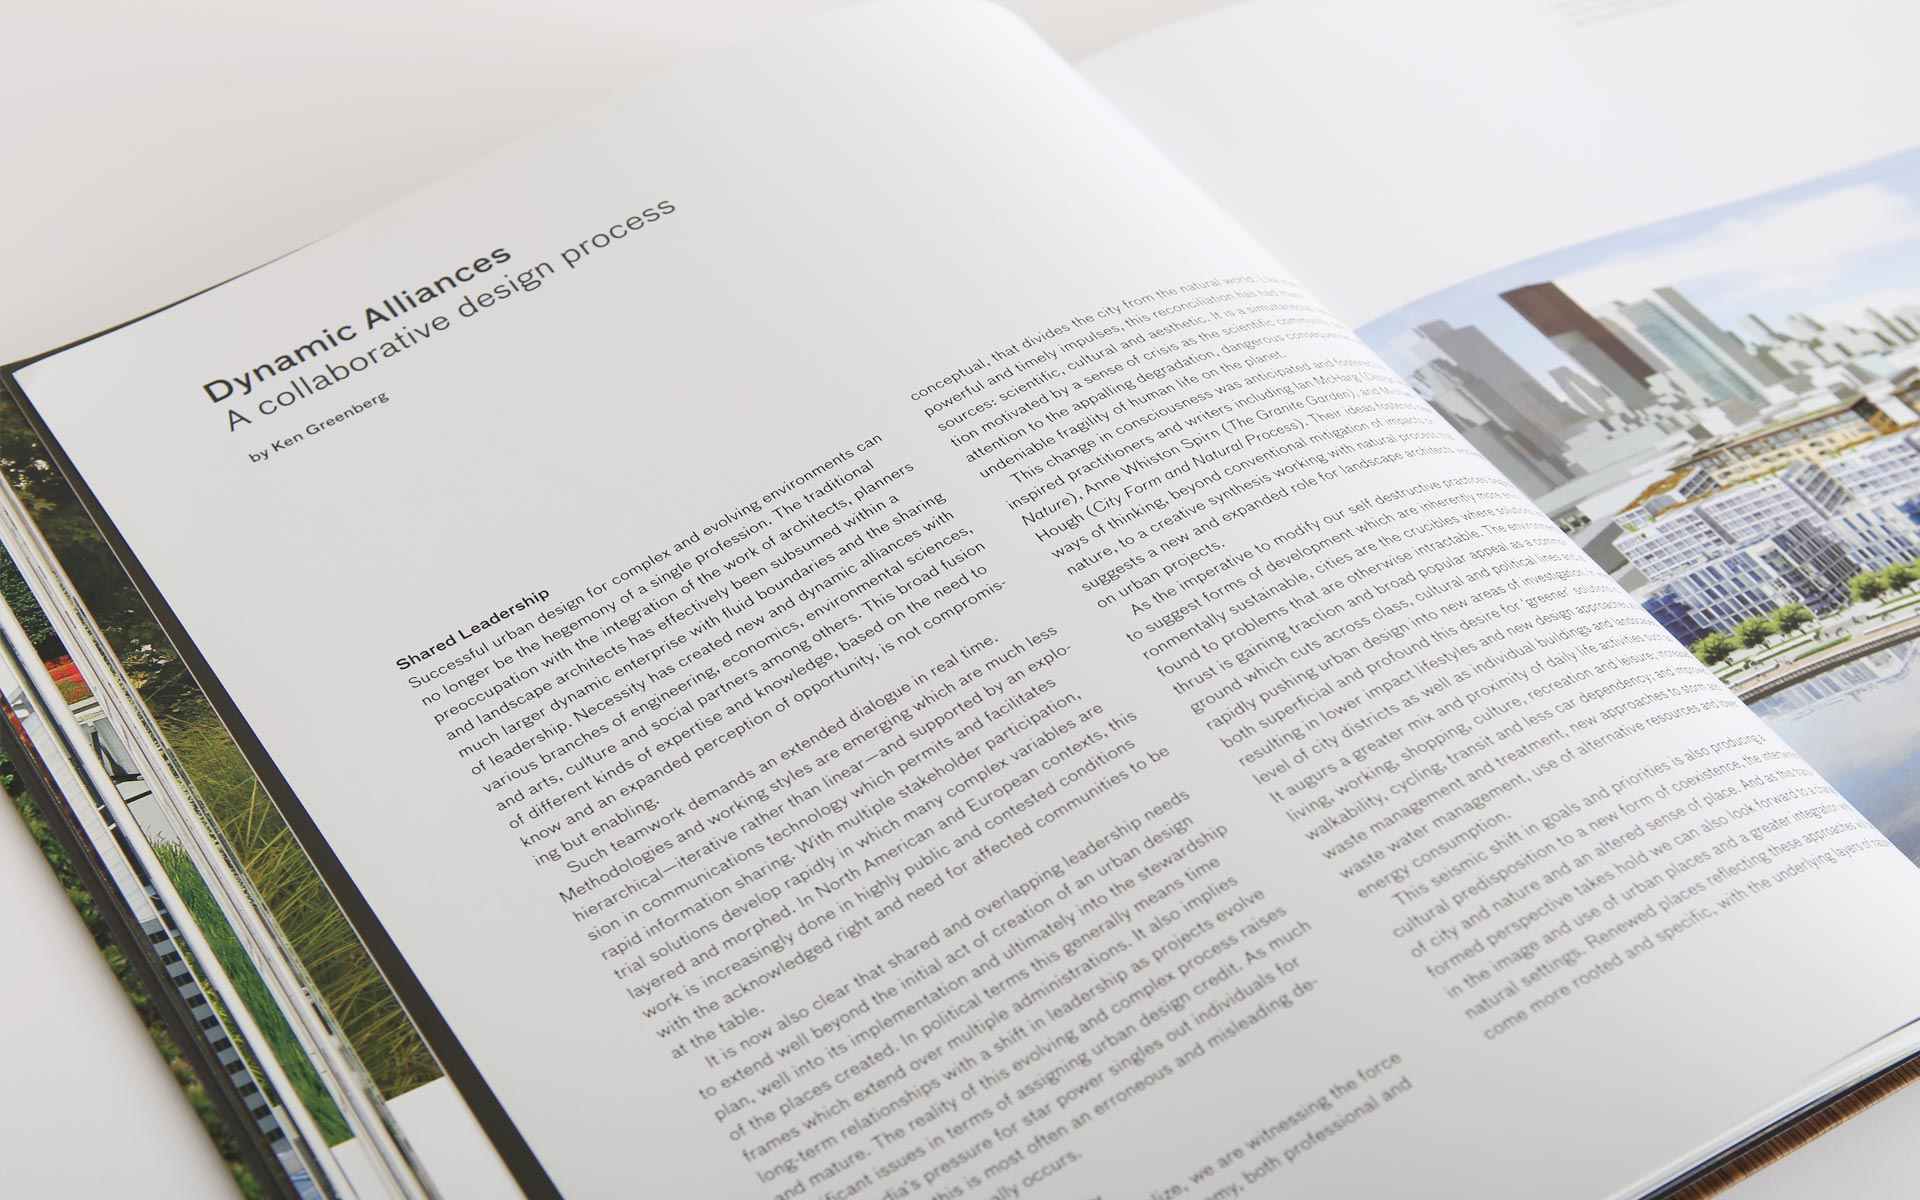 pfs-landscape-architects-book-design-6